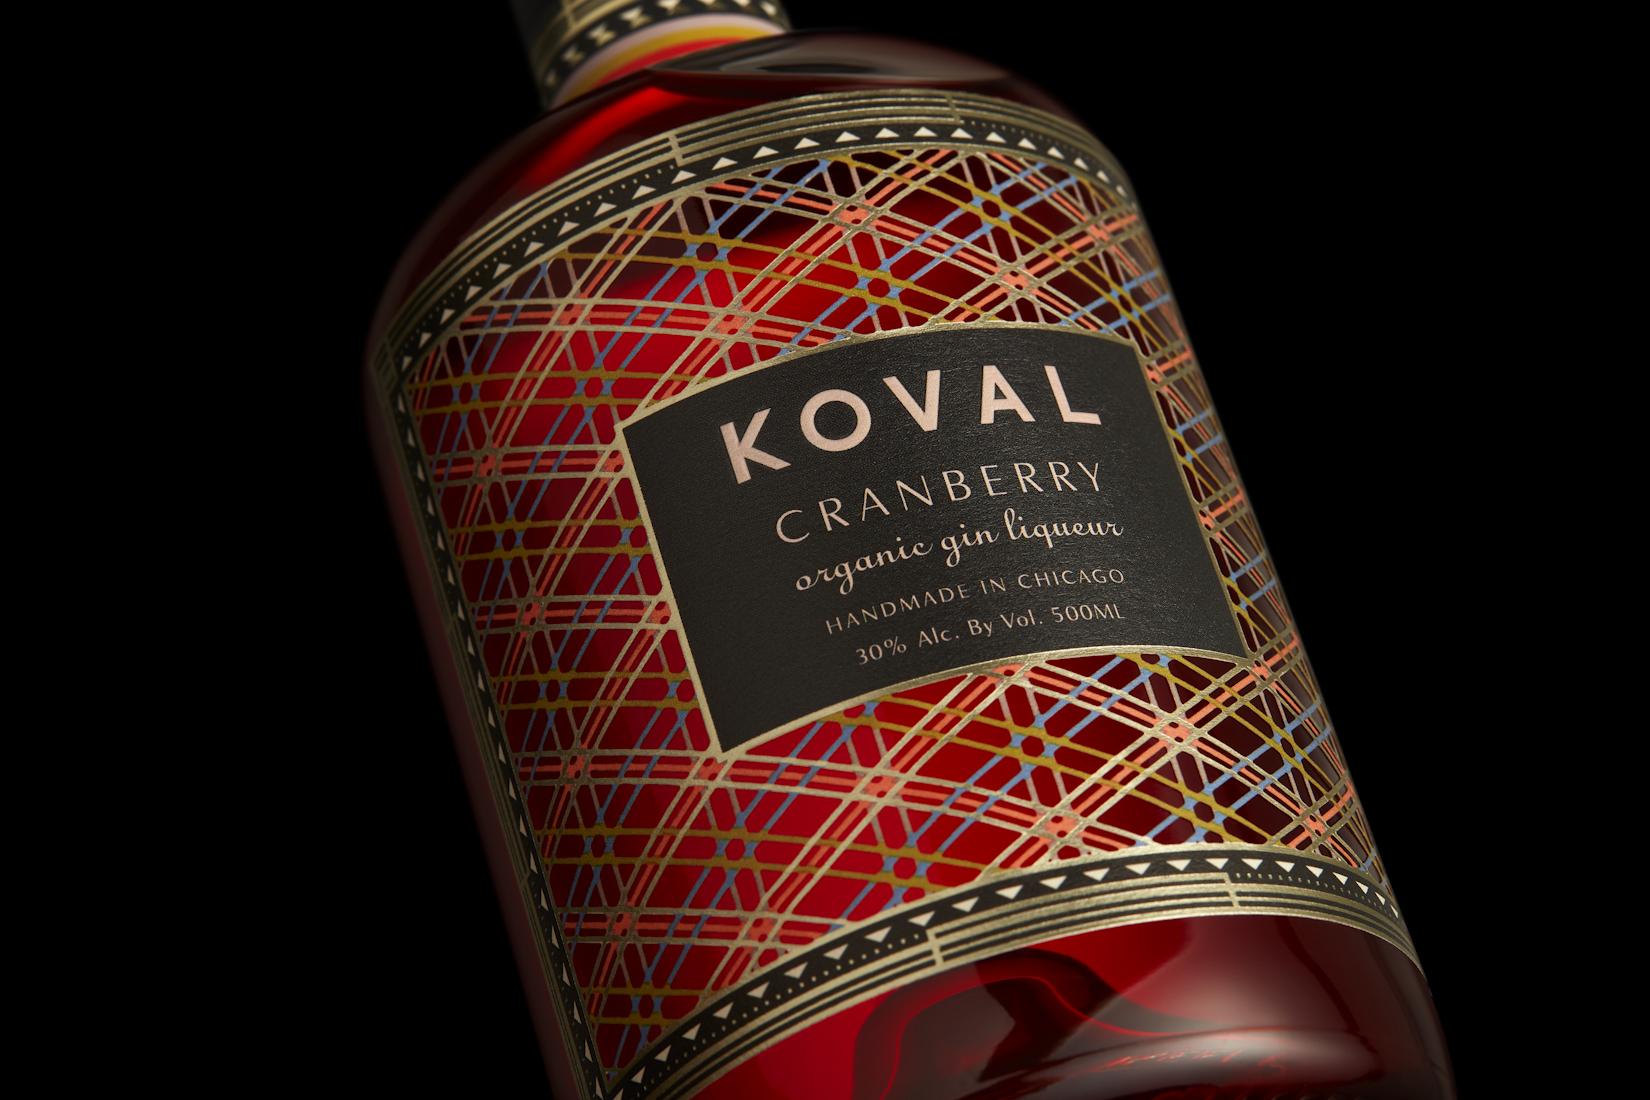 KOVAL_500ml_OrganicCranGin_Detail_OnBlack_F.jpg